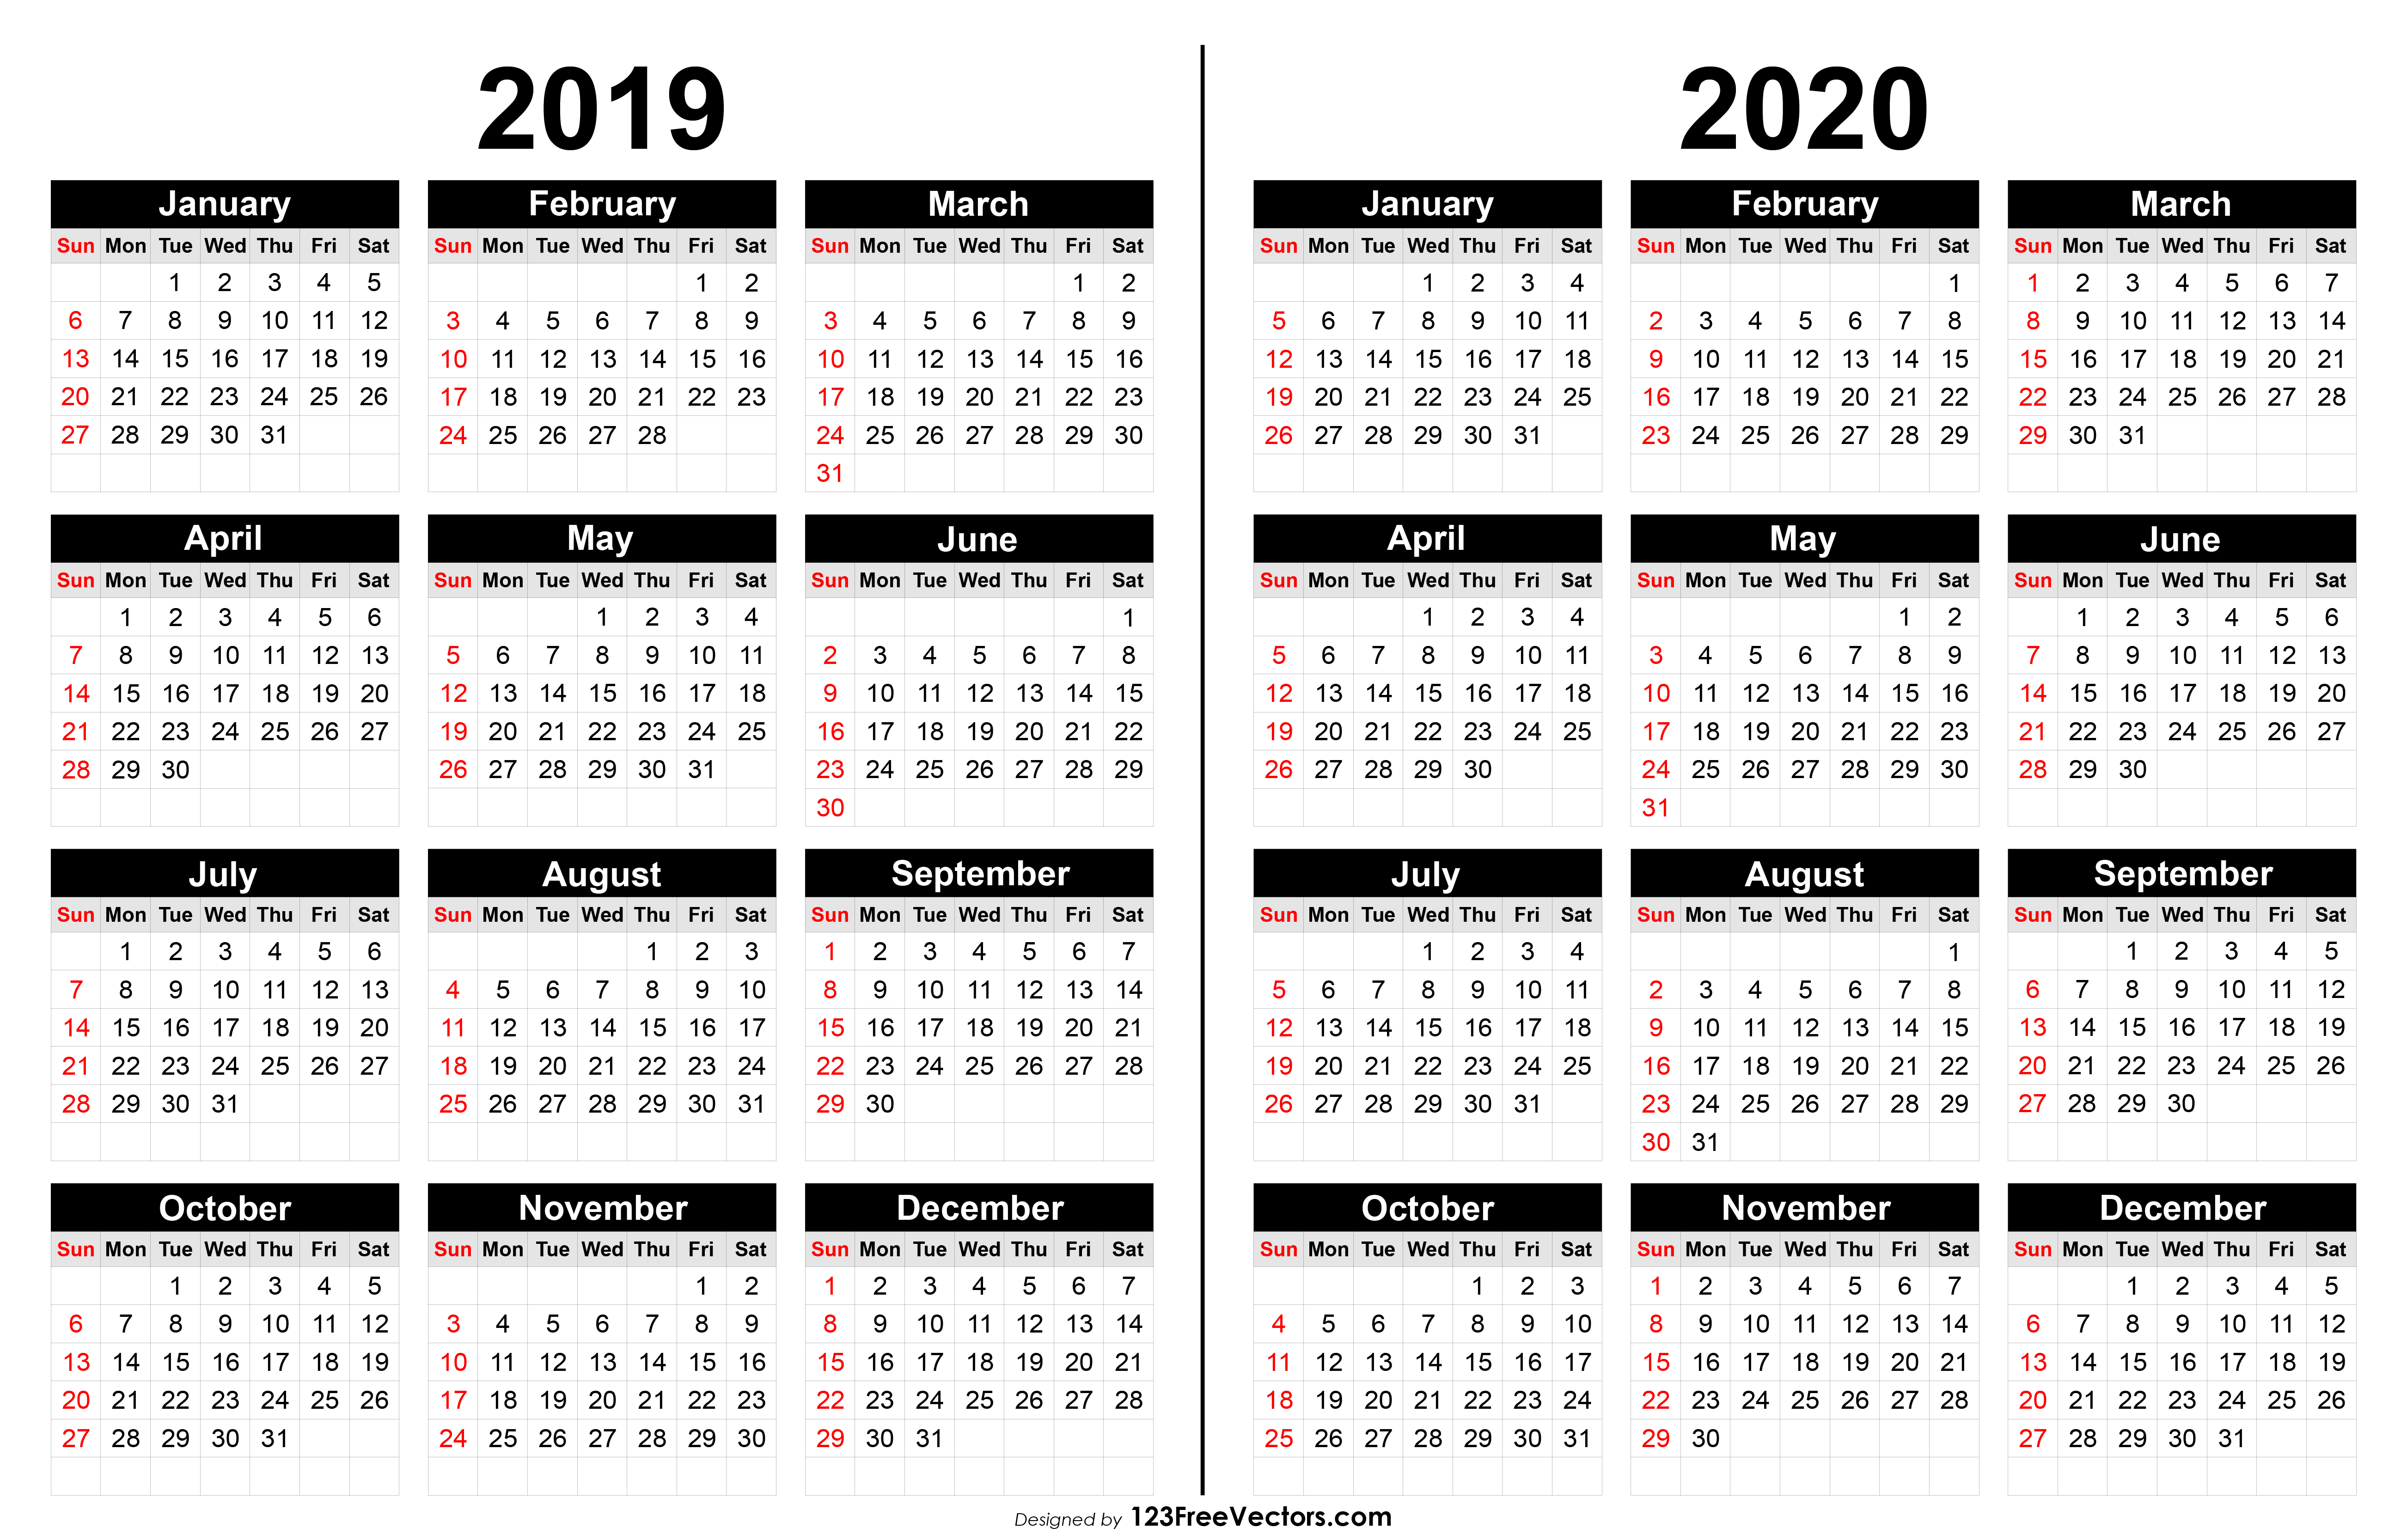 Https://idlewildfurnishing/blank-W-9-2020/ 2019-09-07T10